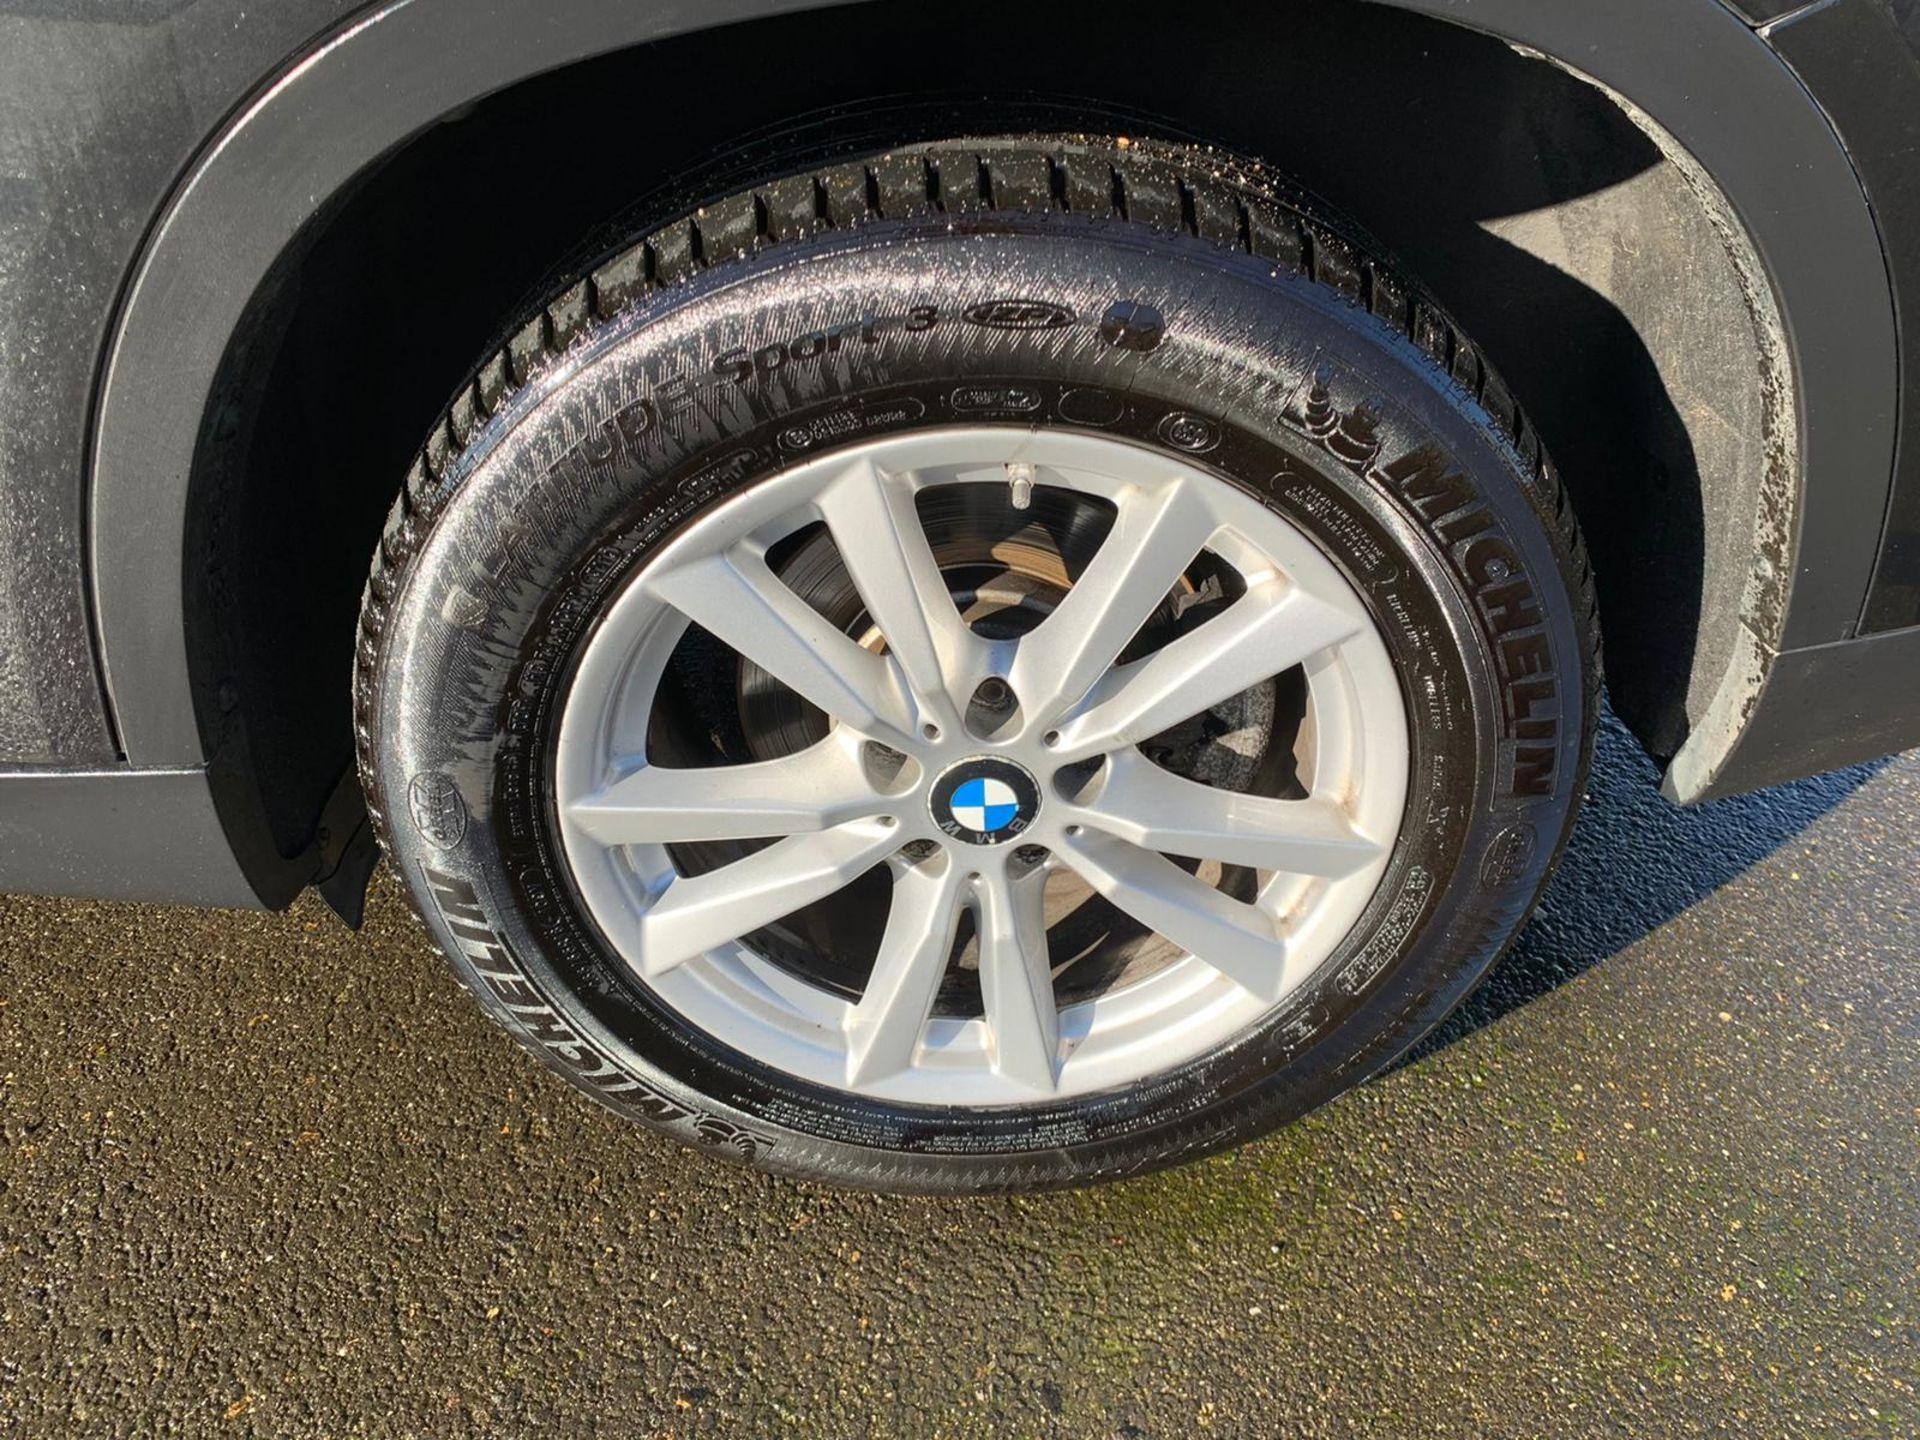 "(Reserve Met) BMW X5 2.0d S-DRIVE ""Special Equipment"" Auto- 7 Seater -16 Reg - Sat Nav- (New Shape) - Image 12 of 43"